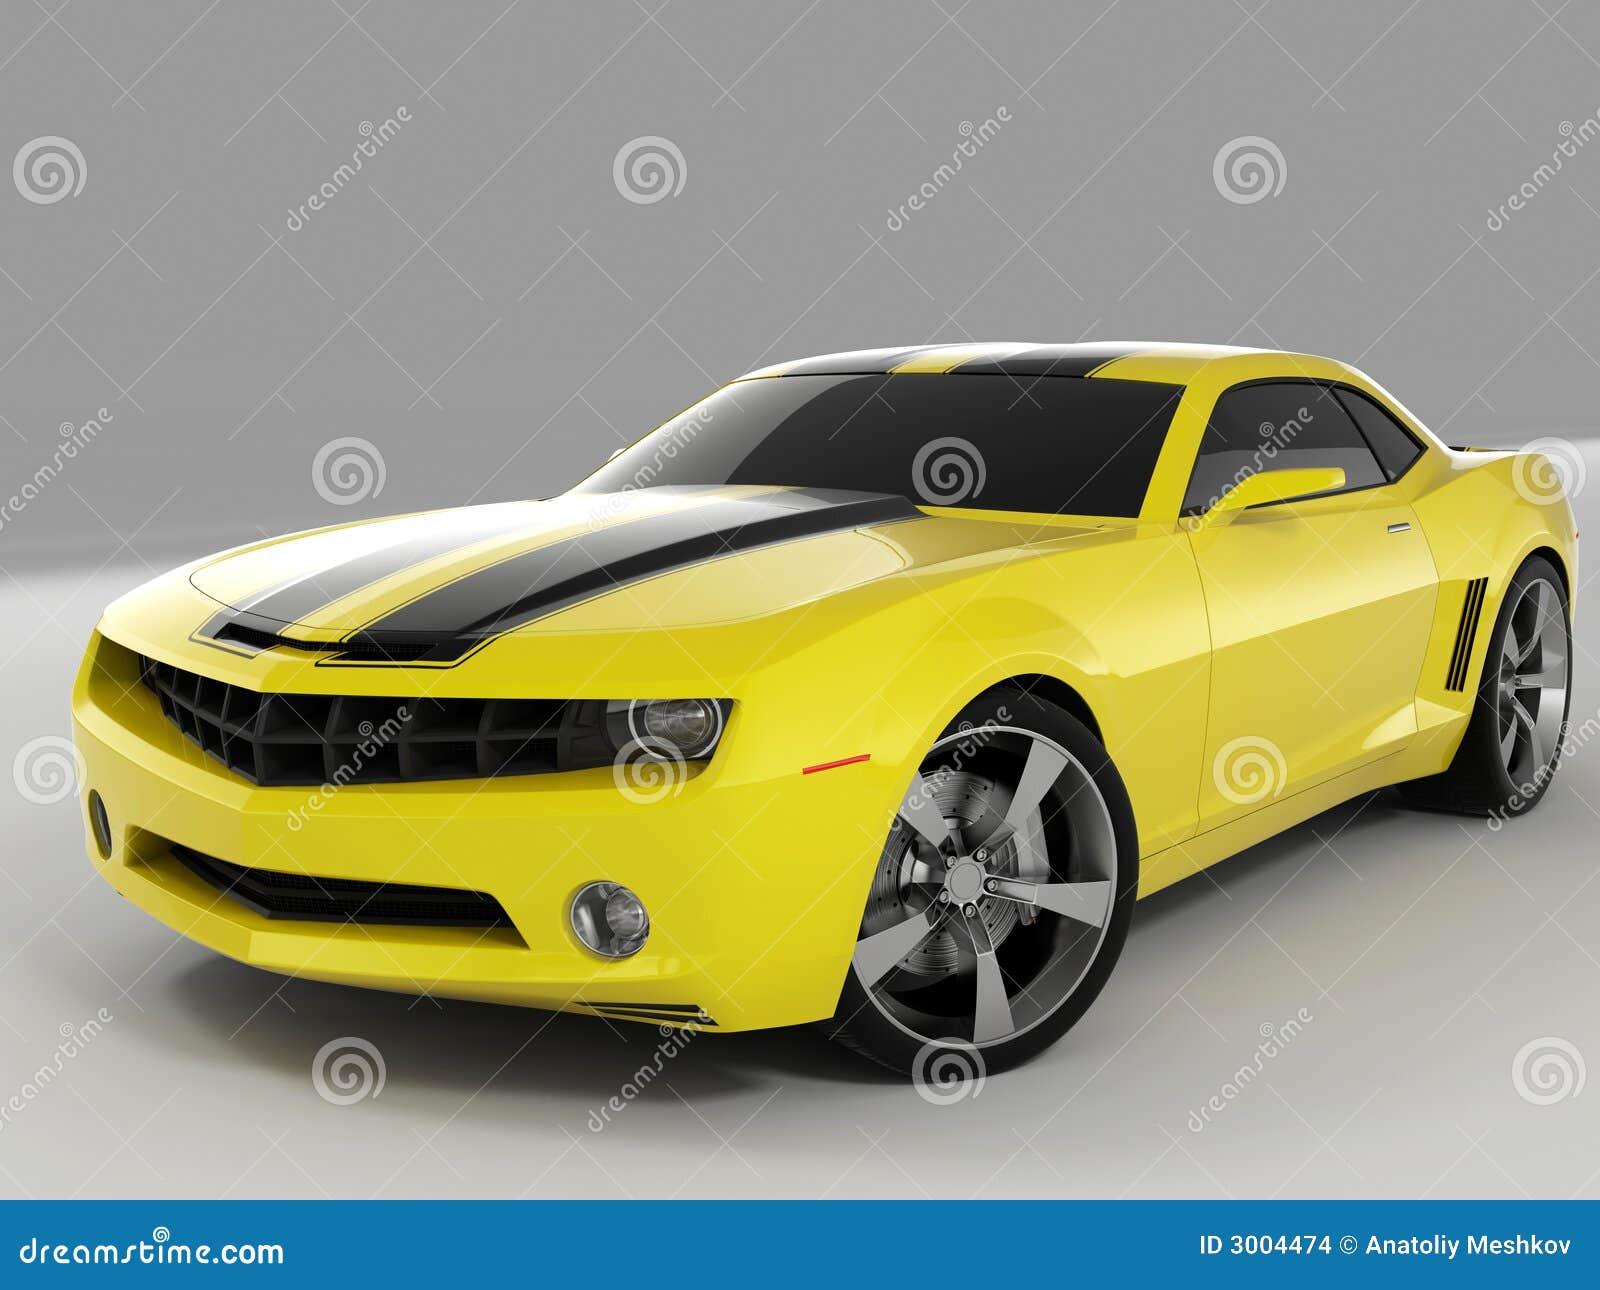 Chevrolet Camaro Concept 2009 Stock Images Image 3004474